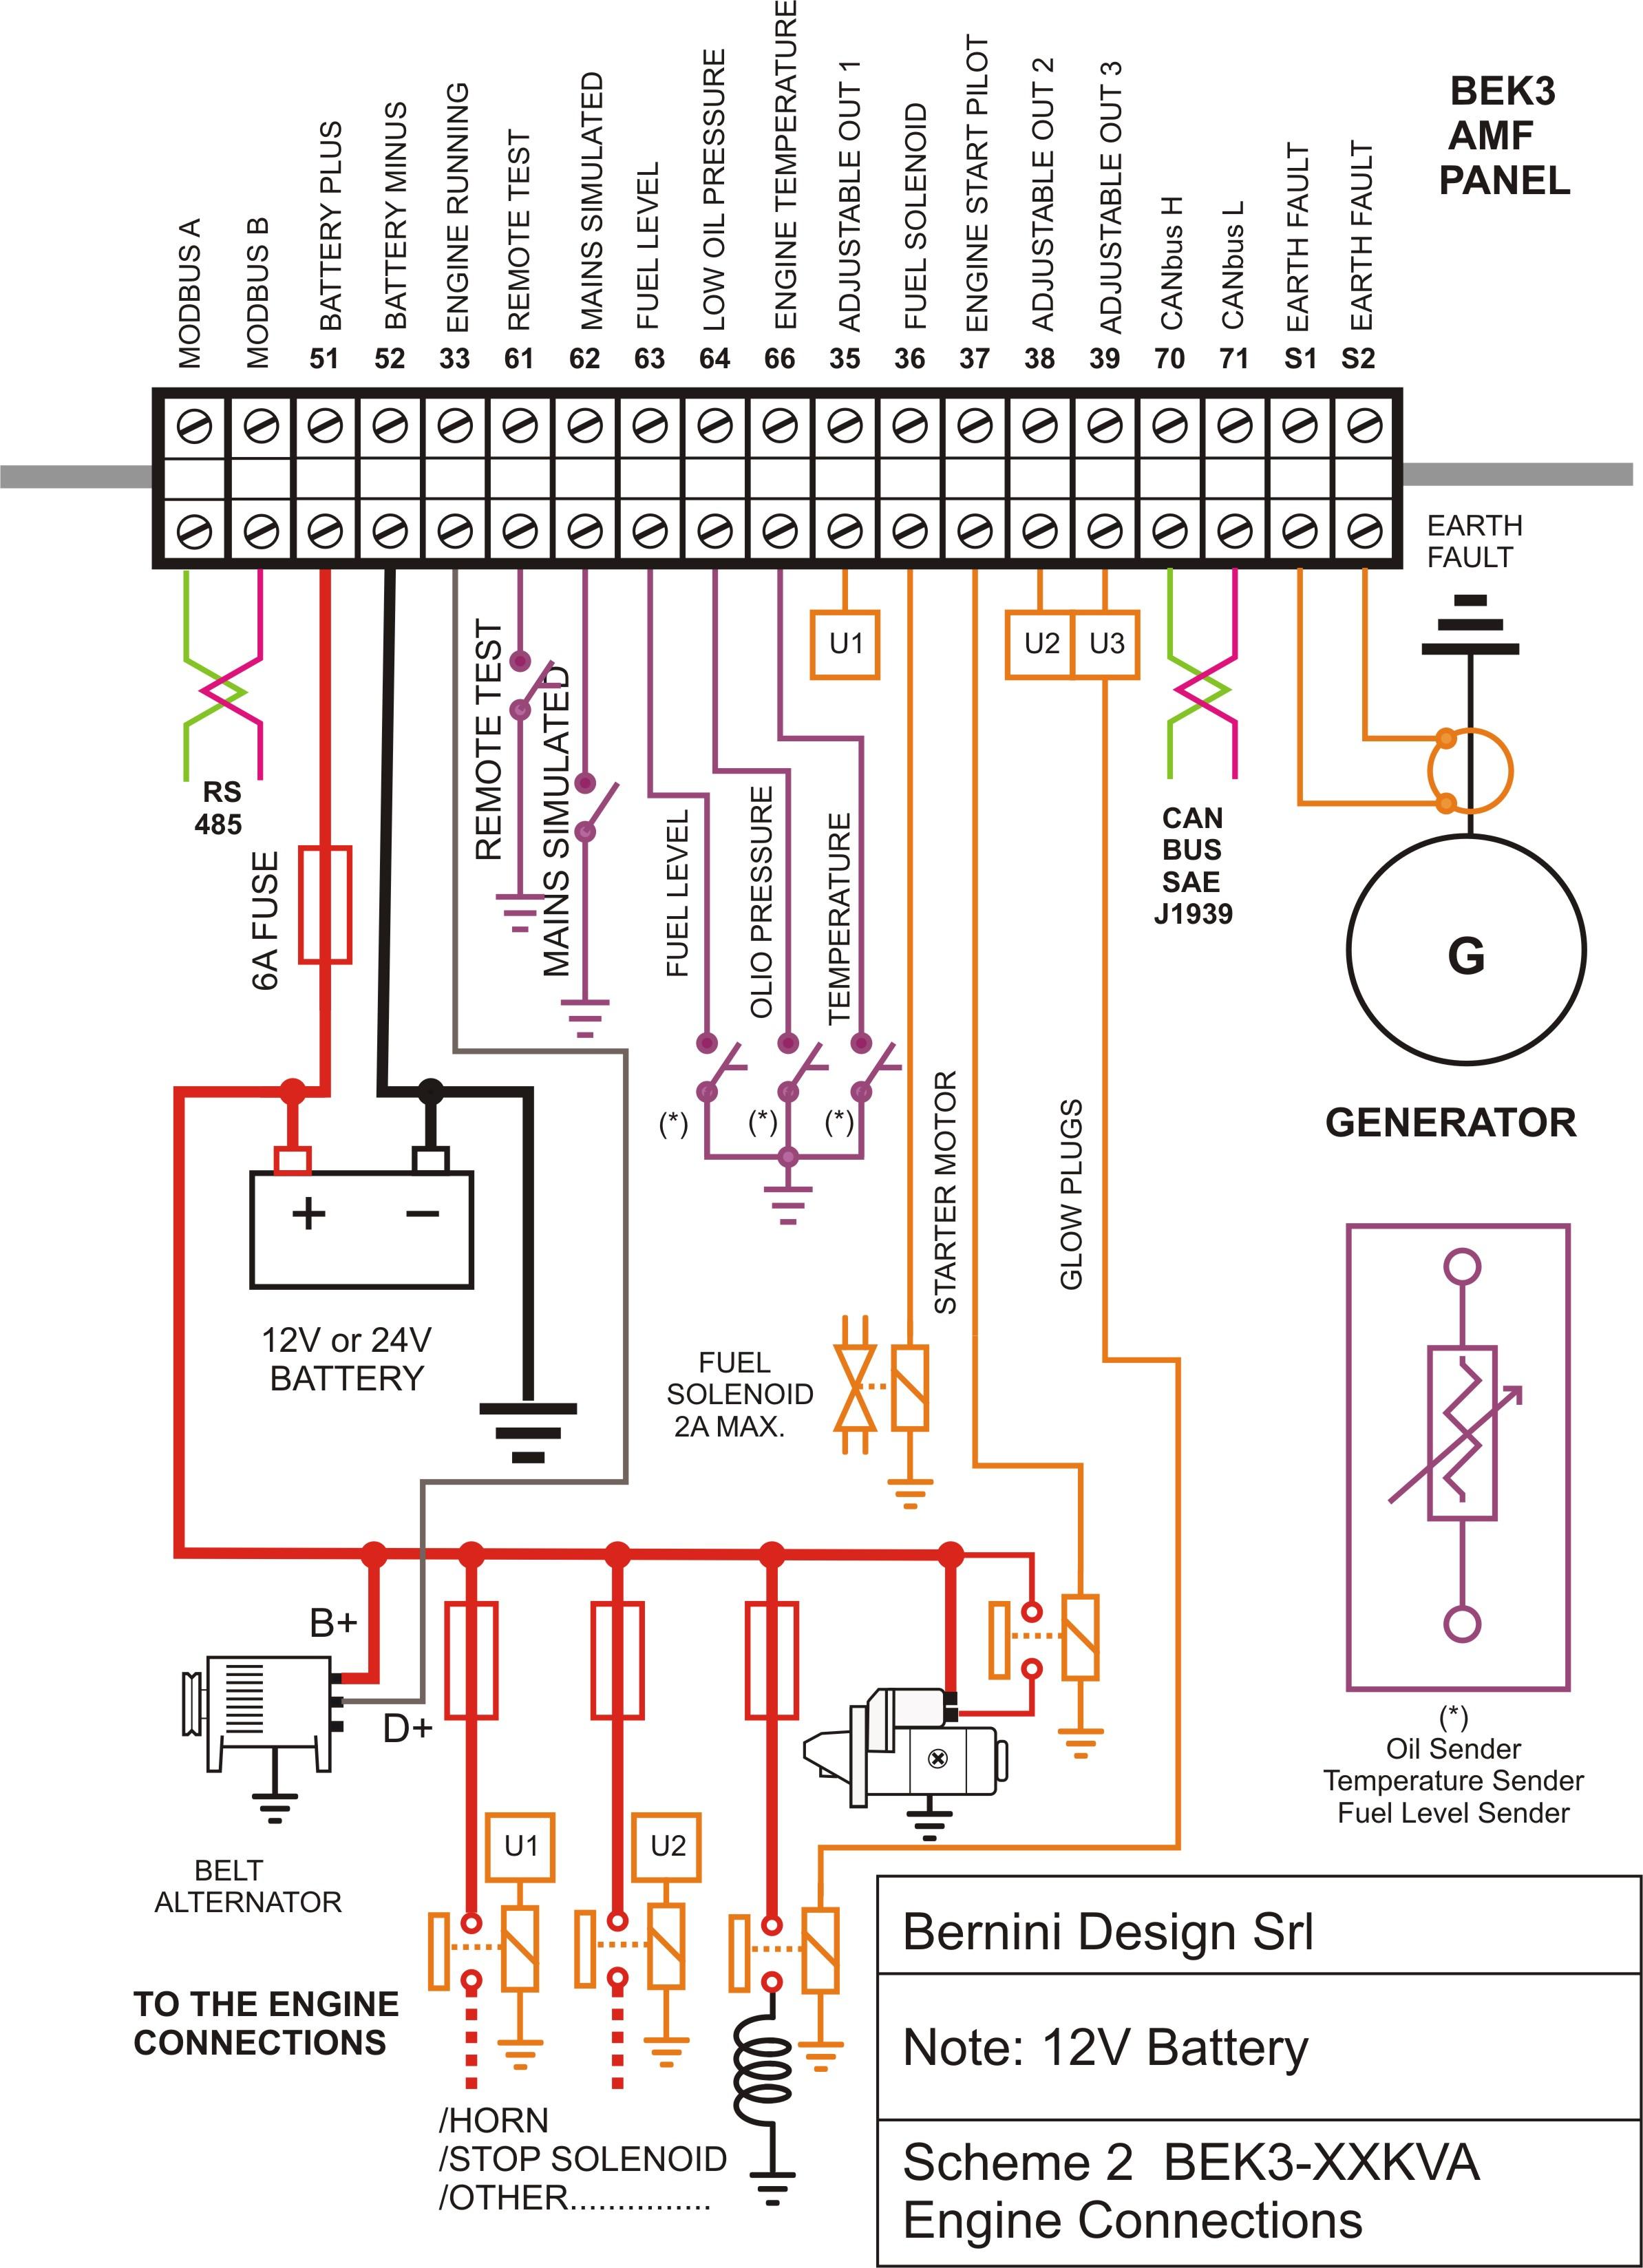 Generator Ats Wiring Diagram - Wiring Diagrams Click - Generator Wiring Diagram